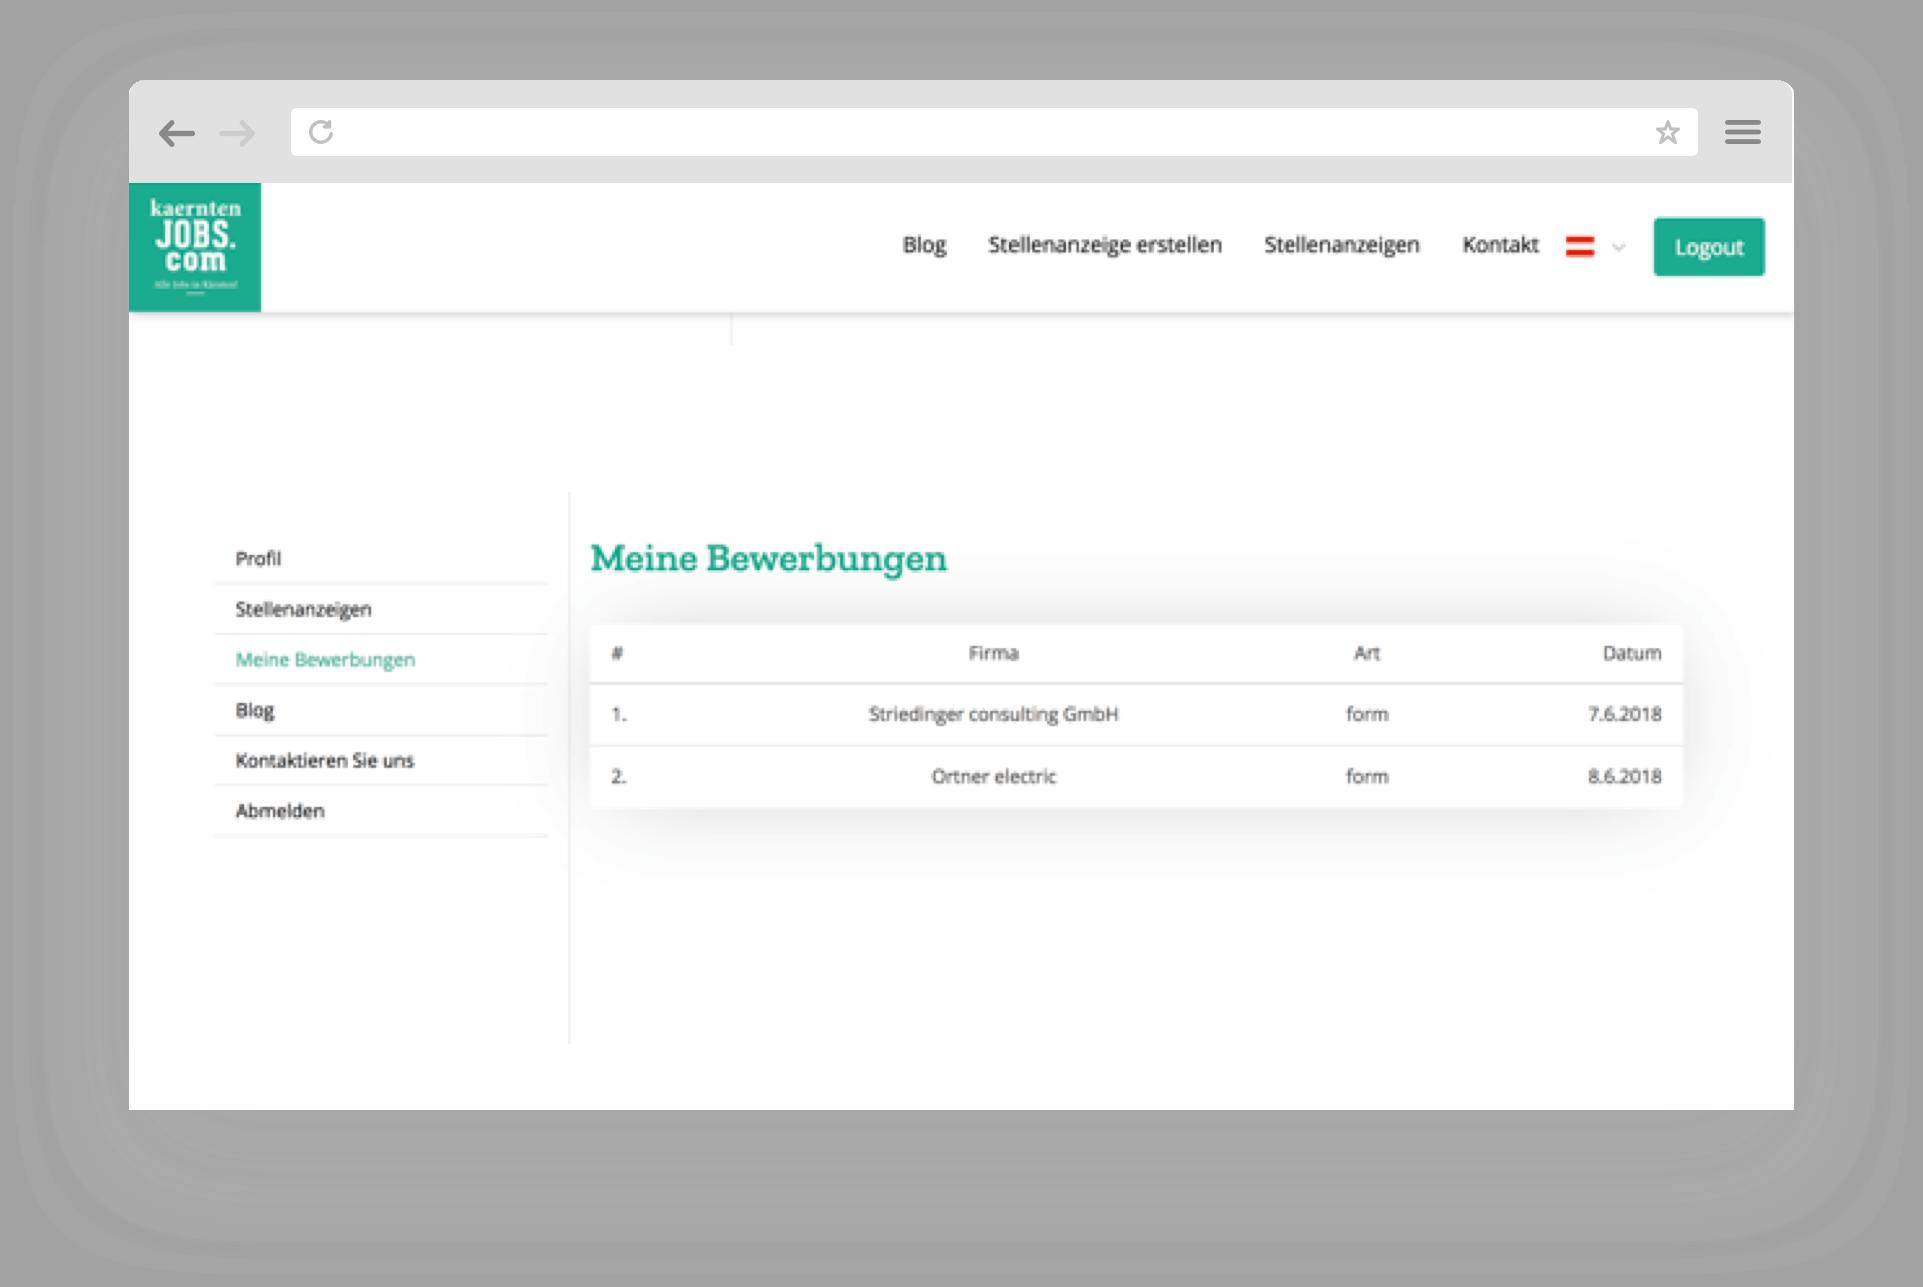 Steiermarkjobs.com Applications